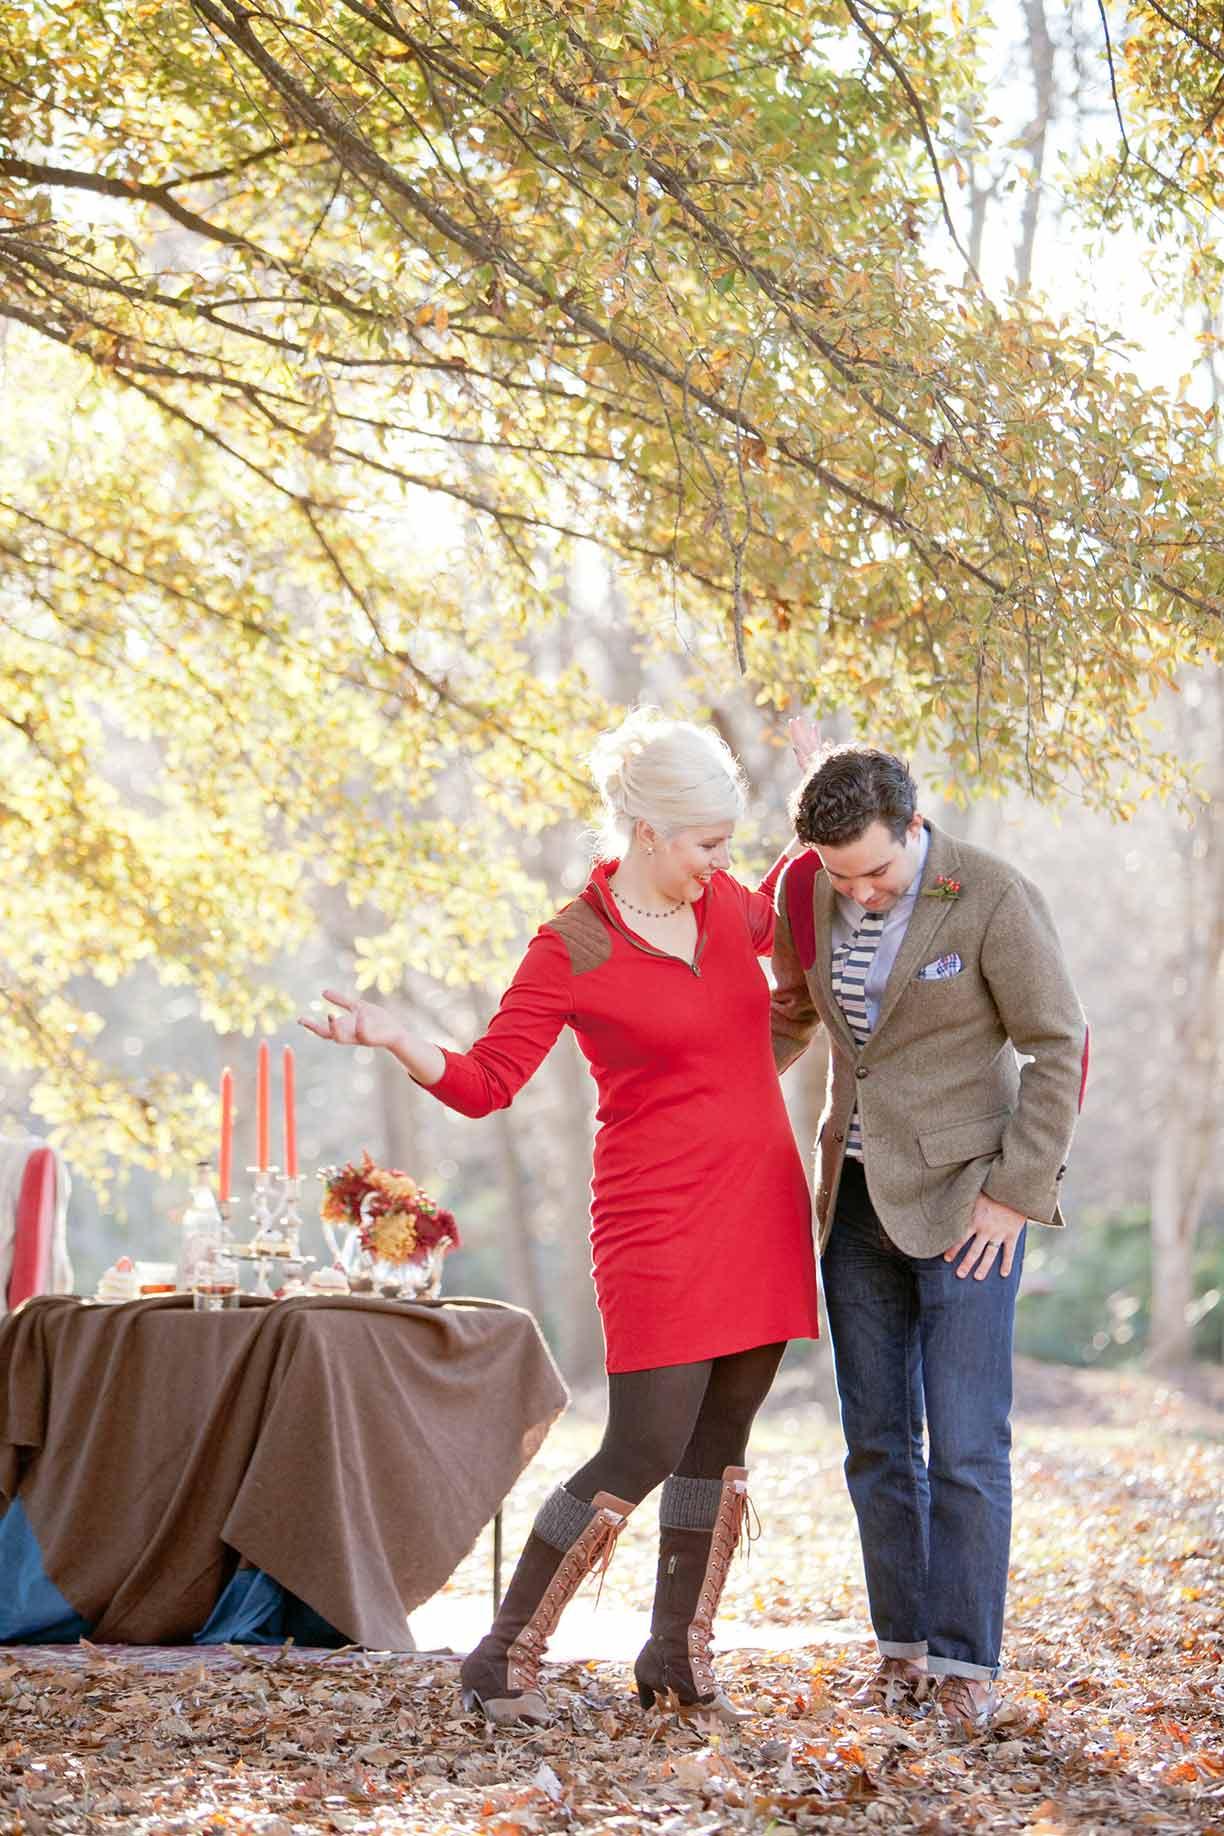 Hannah & Husband collaboration with Leah Bullard Photography